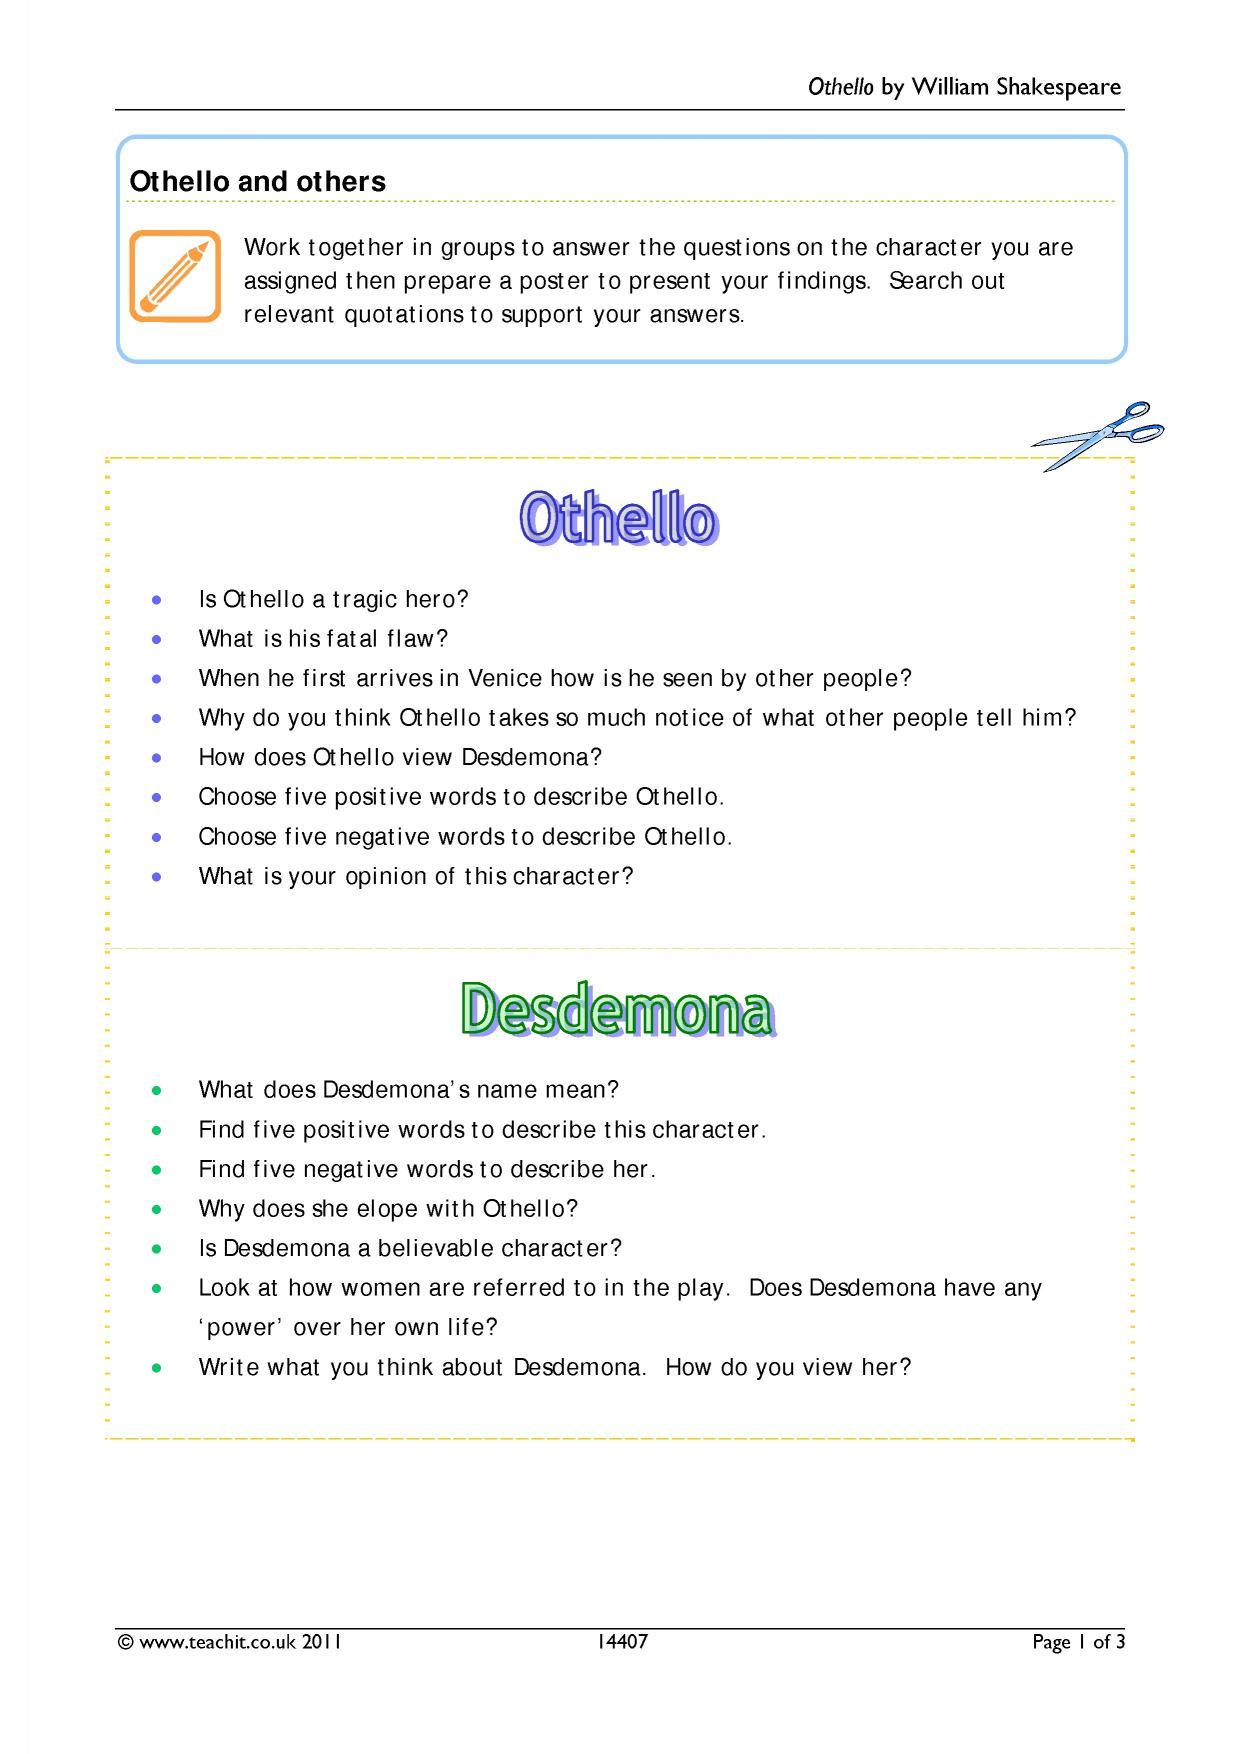 othello a tragic hero essay Recent posts othello tragic hero essay zaptv: teacher's guide to creative writing child growth & development- an educational program on careworld tv.